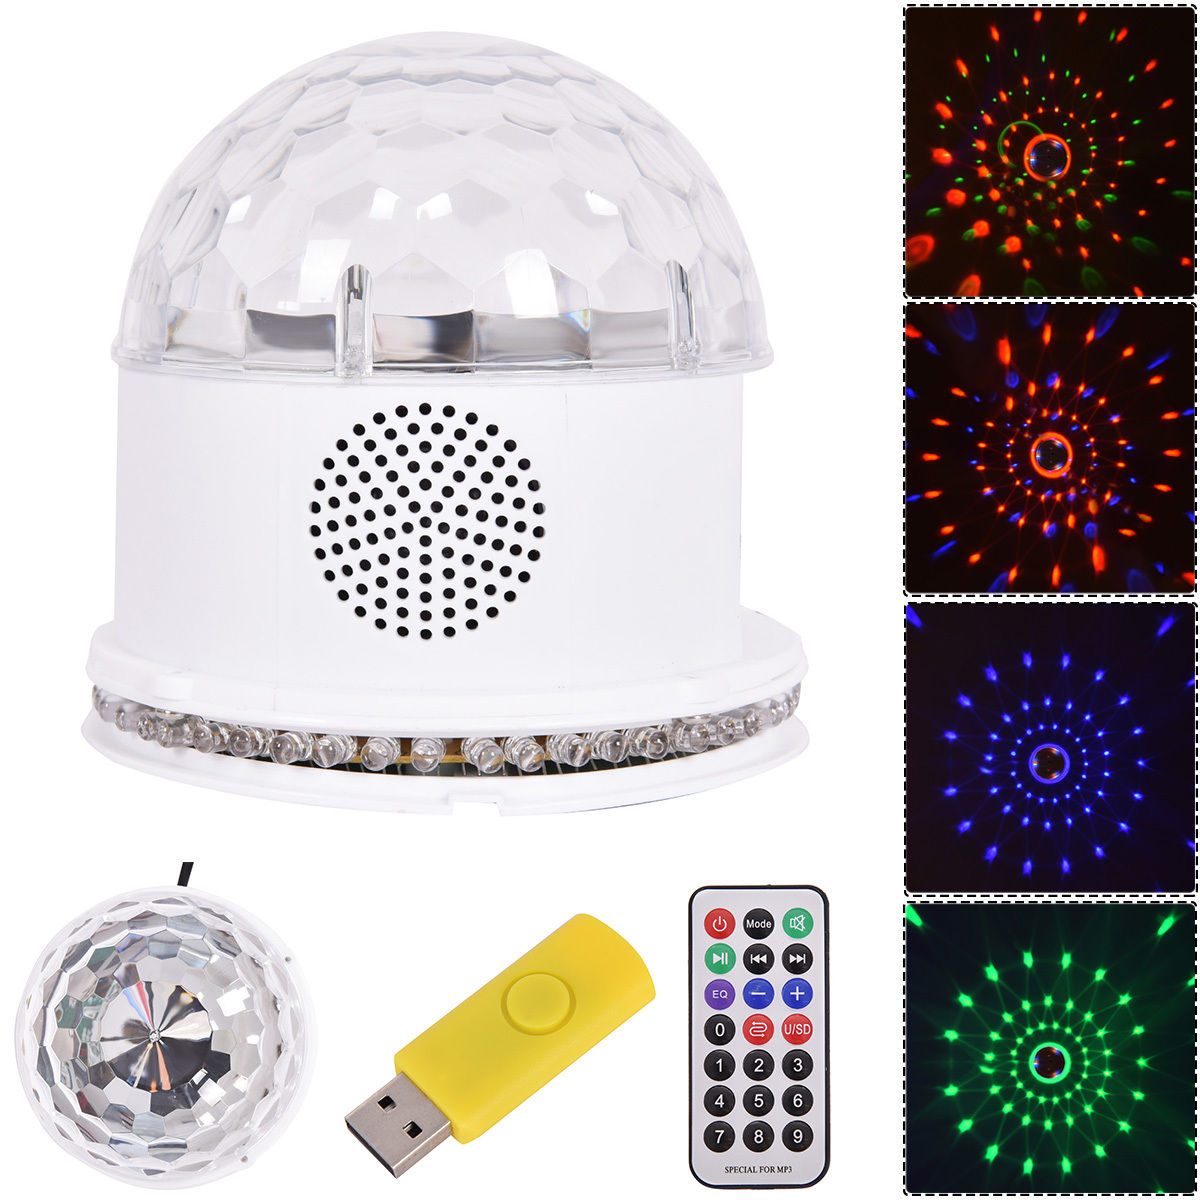 Costway 10W MP3 RGB 48 LED Crystal Magic Ball Stage Light Digital Disco DJ KTV Party by Costway